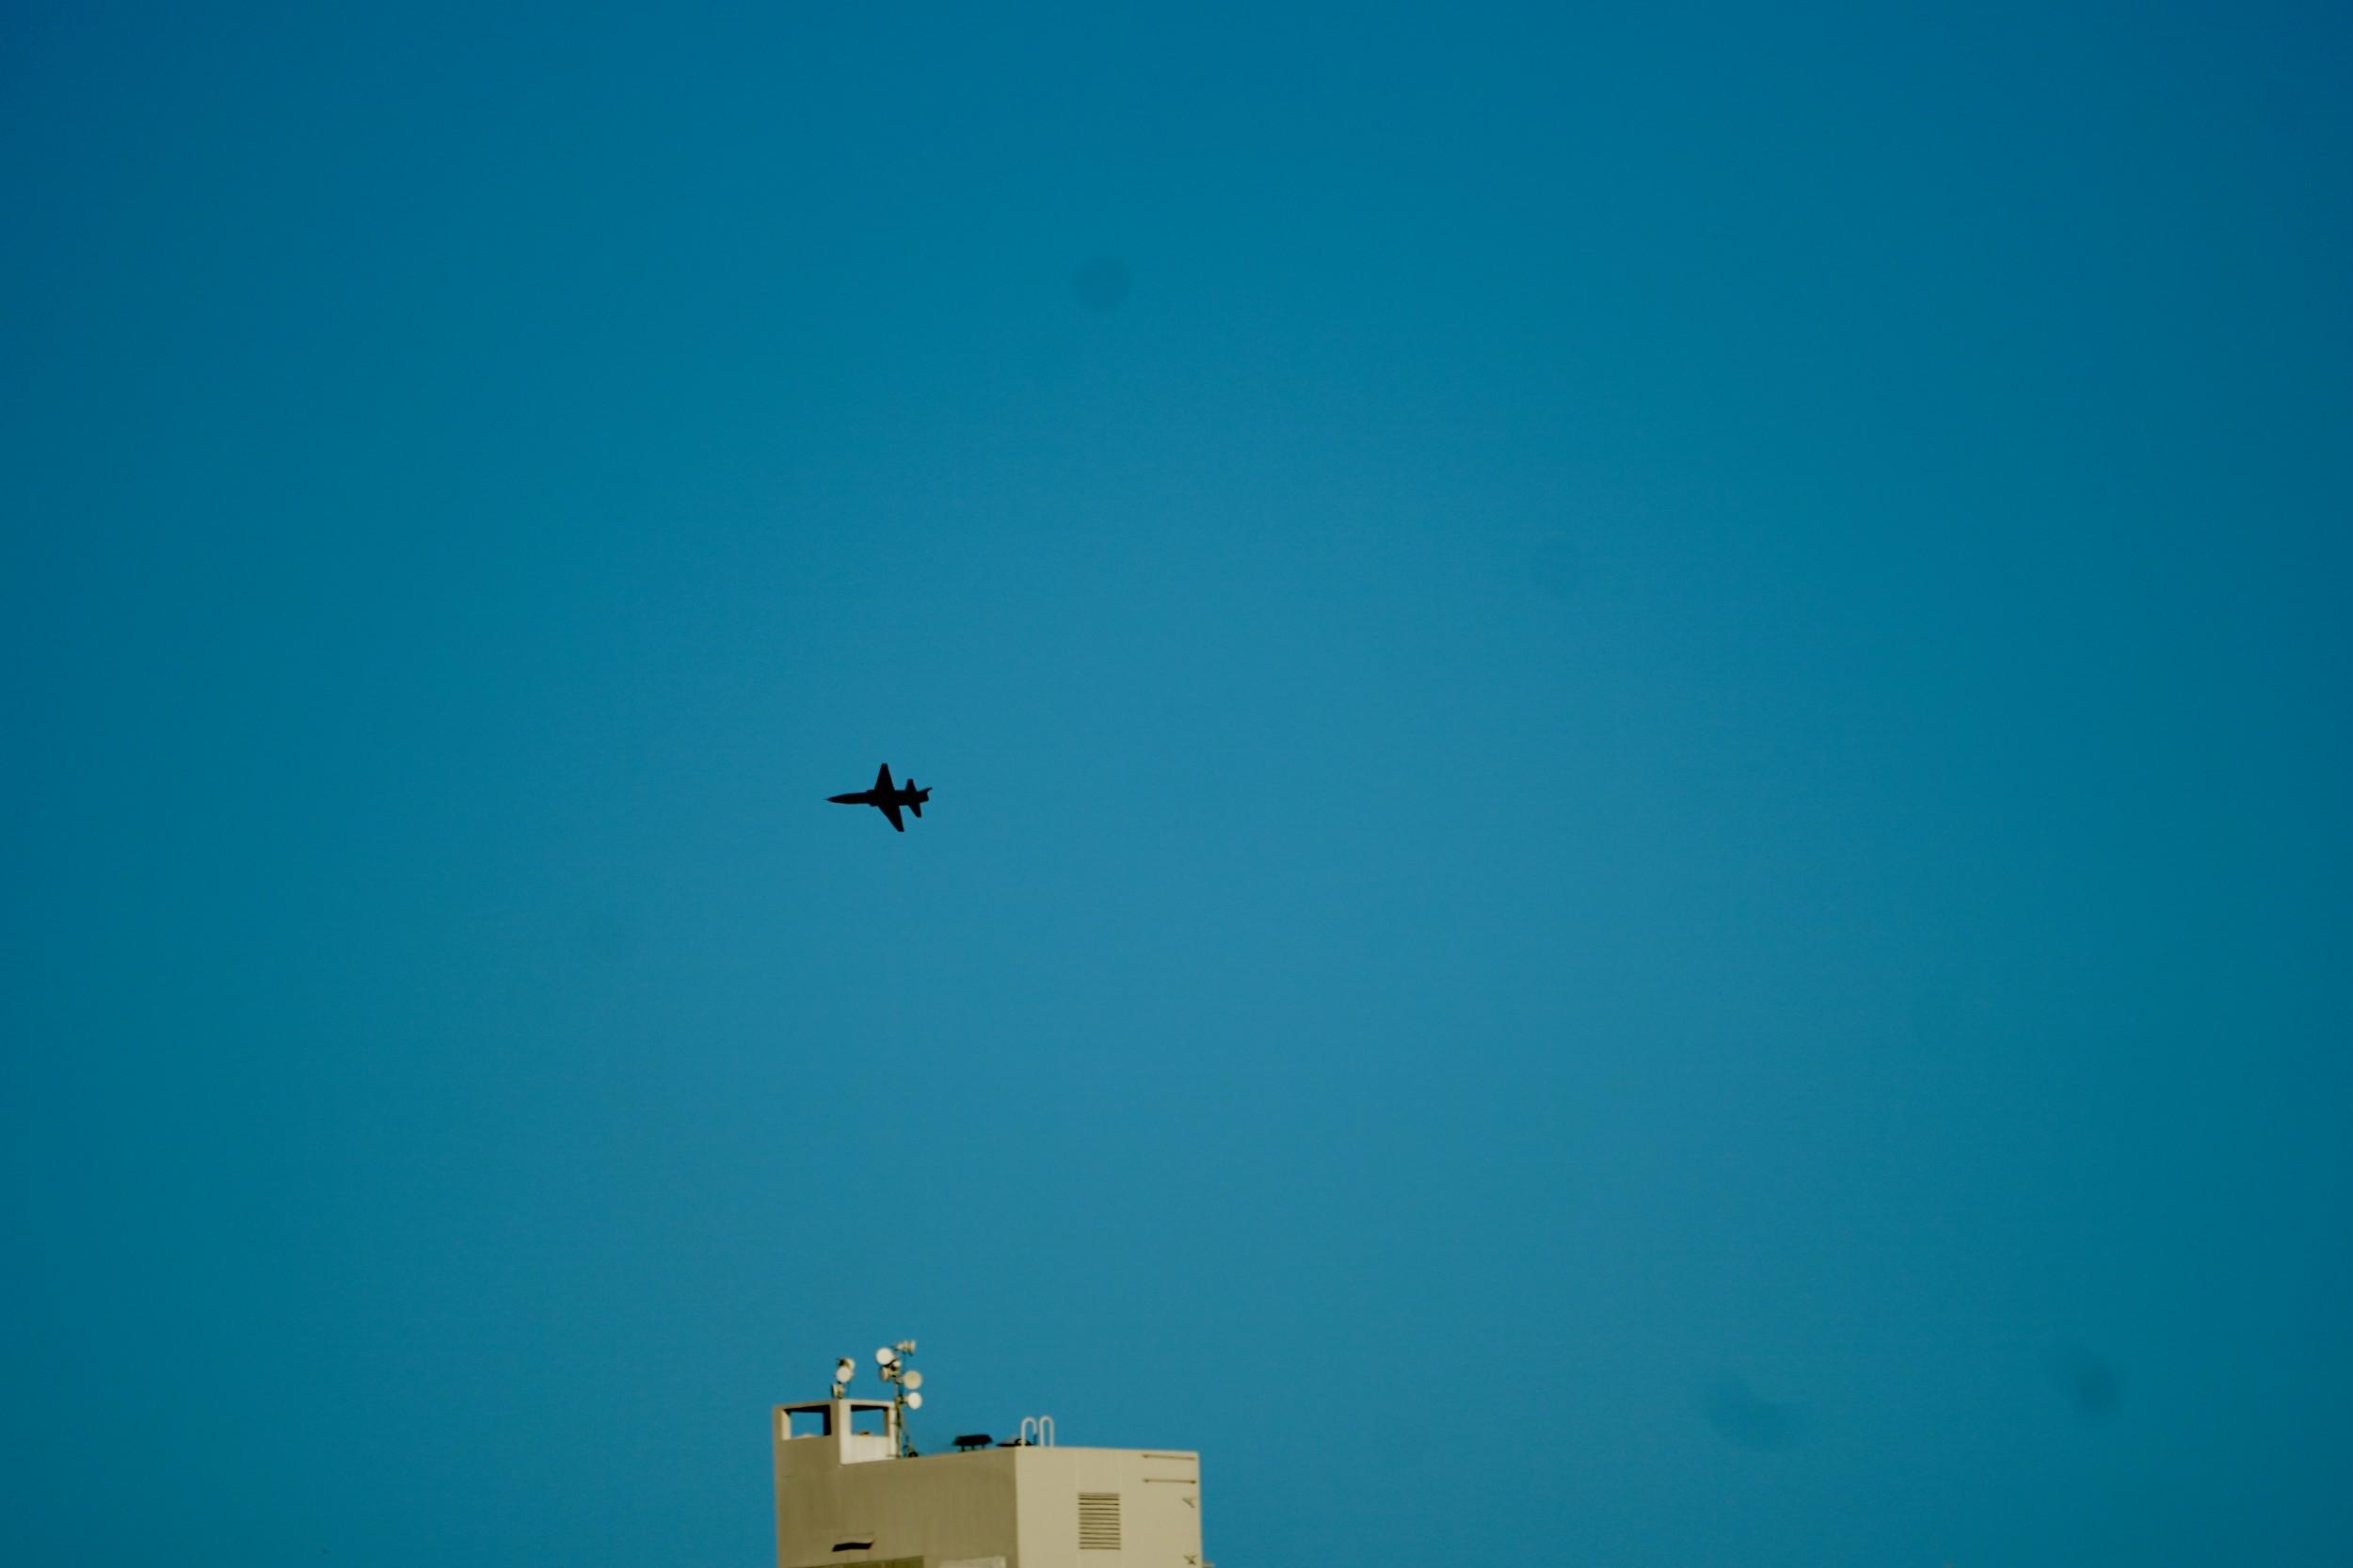 Talon T-38 flies over San Francisco